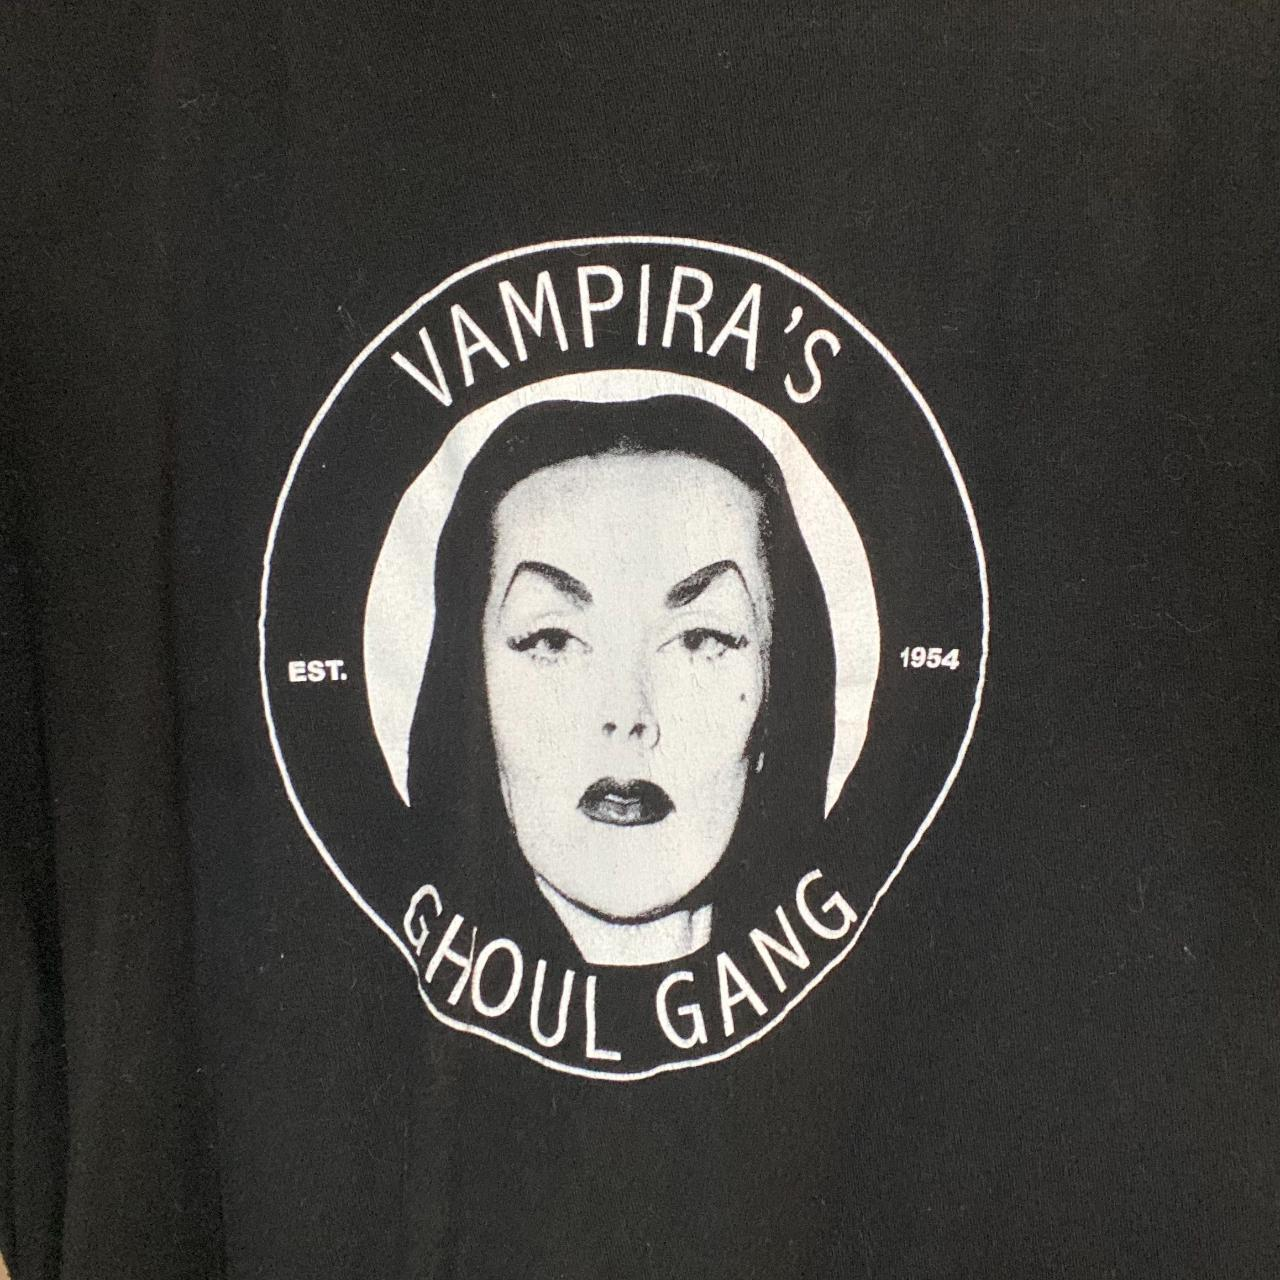 Product Image 1 - Vampira's Ghoul Gang t-shirt, unisex